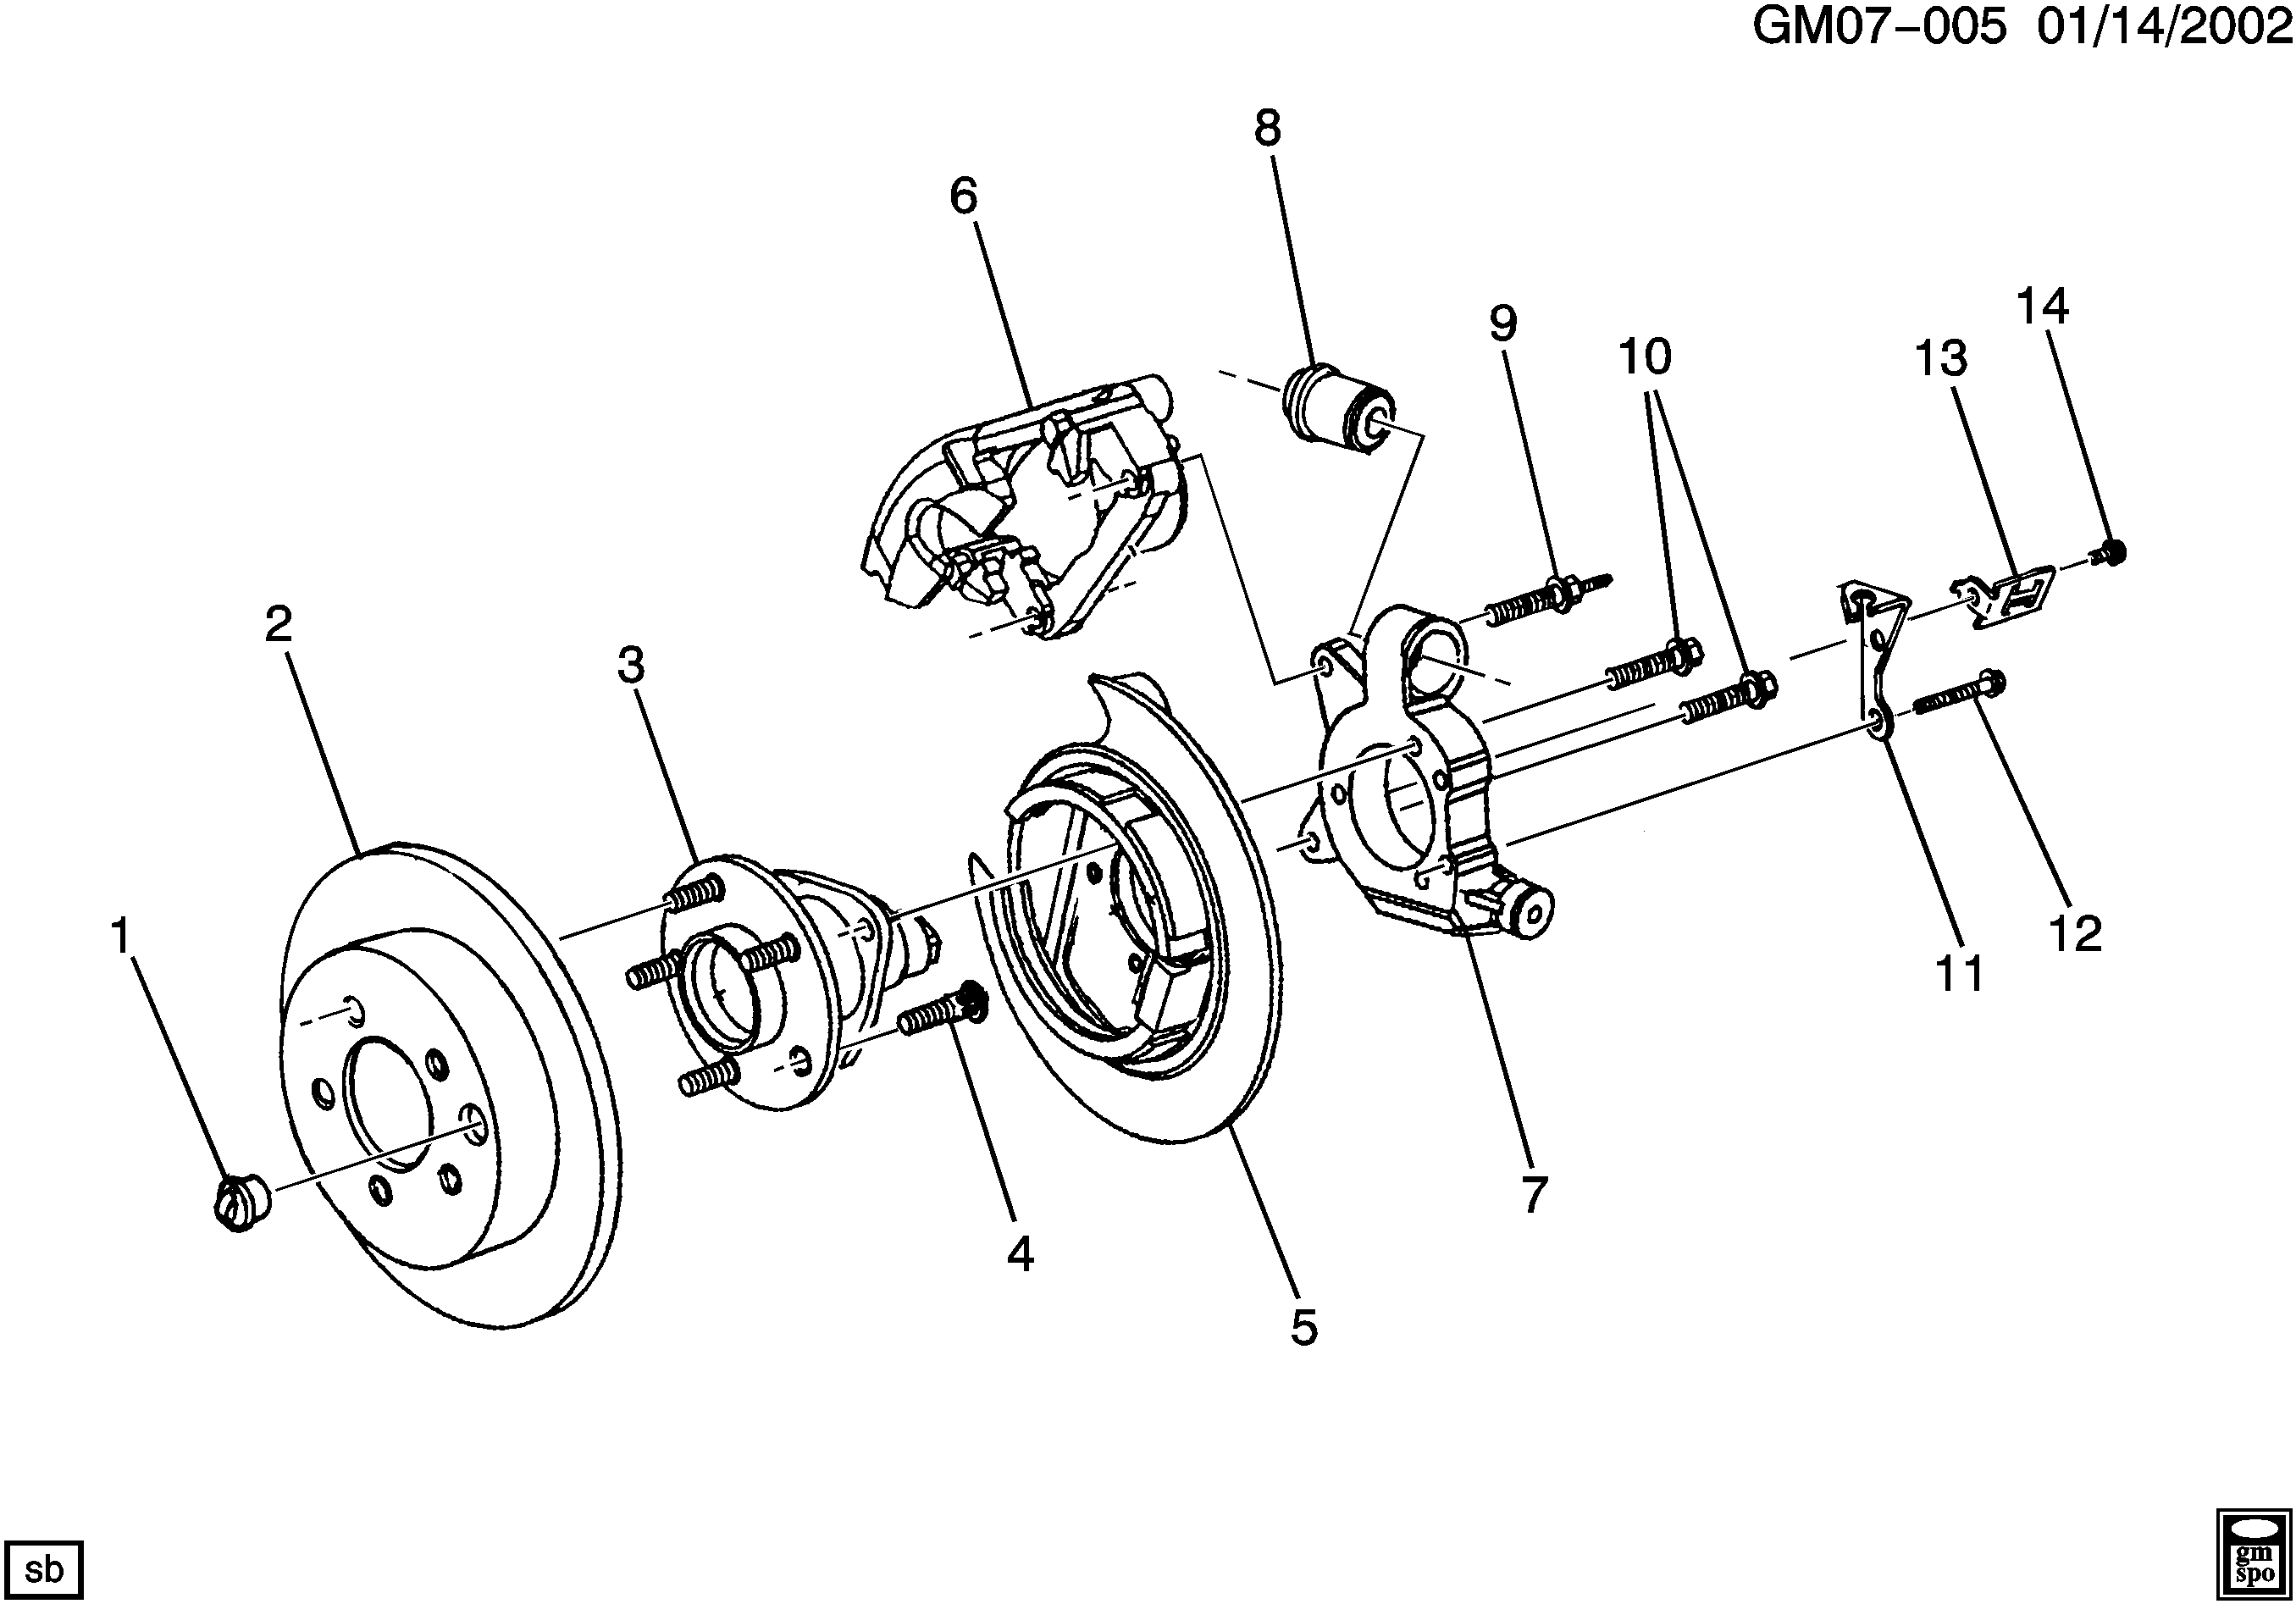 Buick Rendezvous Rear Suspension Diagram